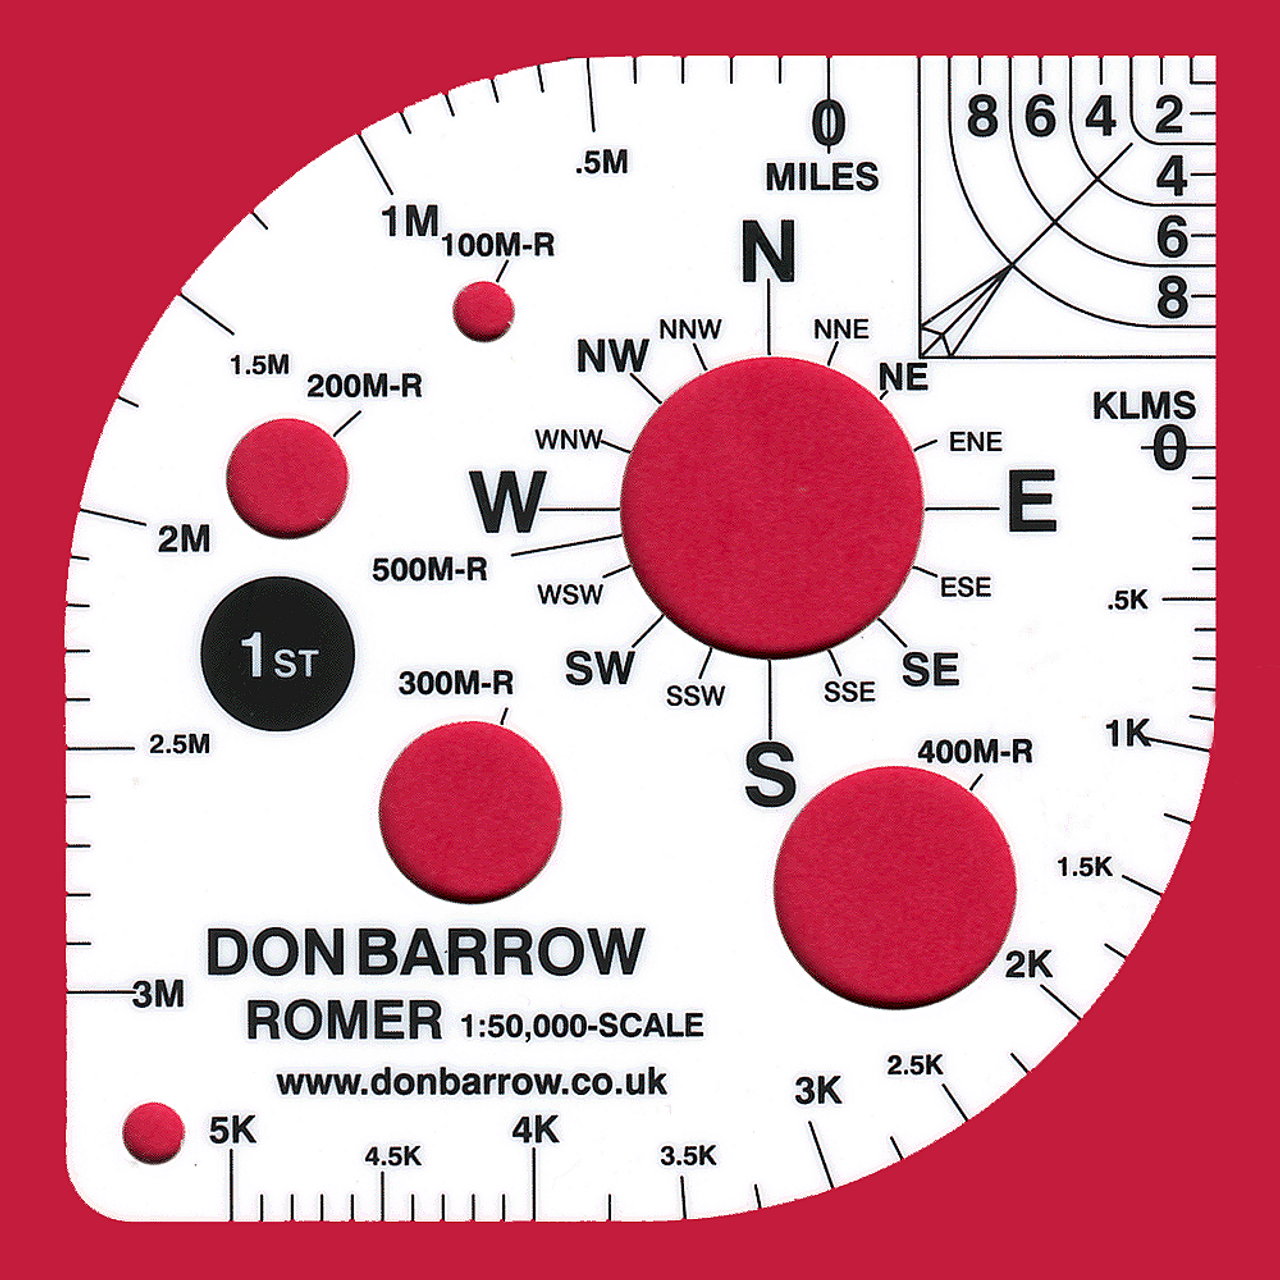 Don Barrow Super Romer